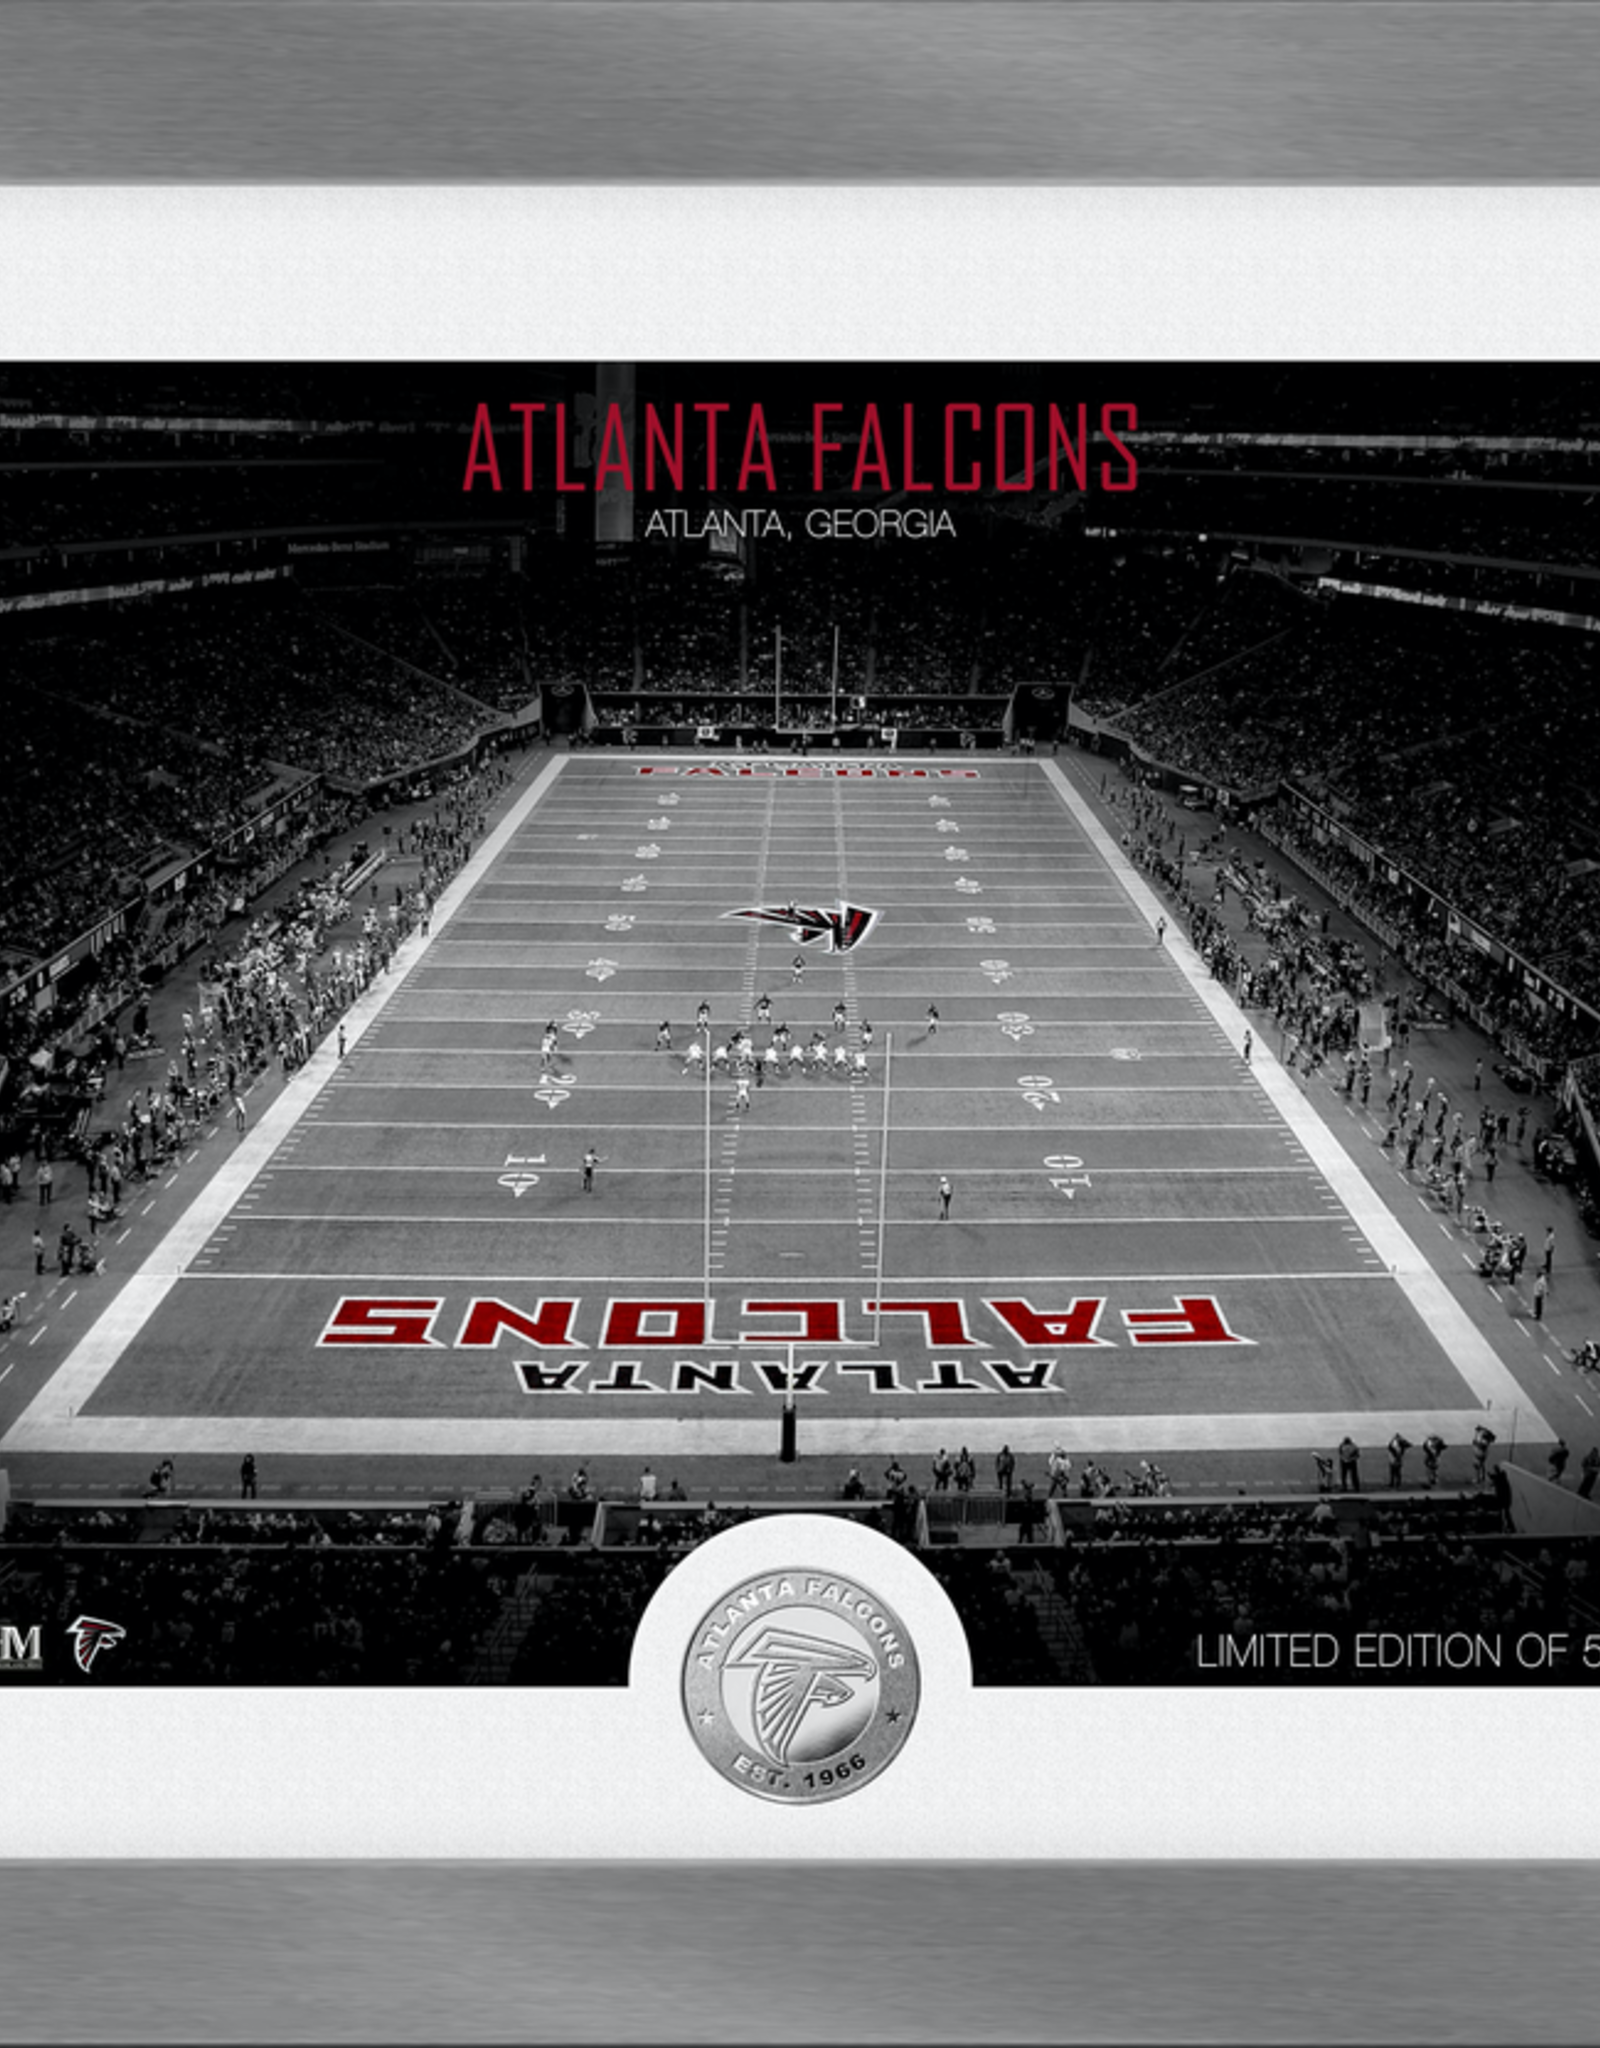 HIGHLAND MINT Atlanta Falcons Framed Art Deco Stadium with Silver Coin